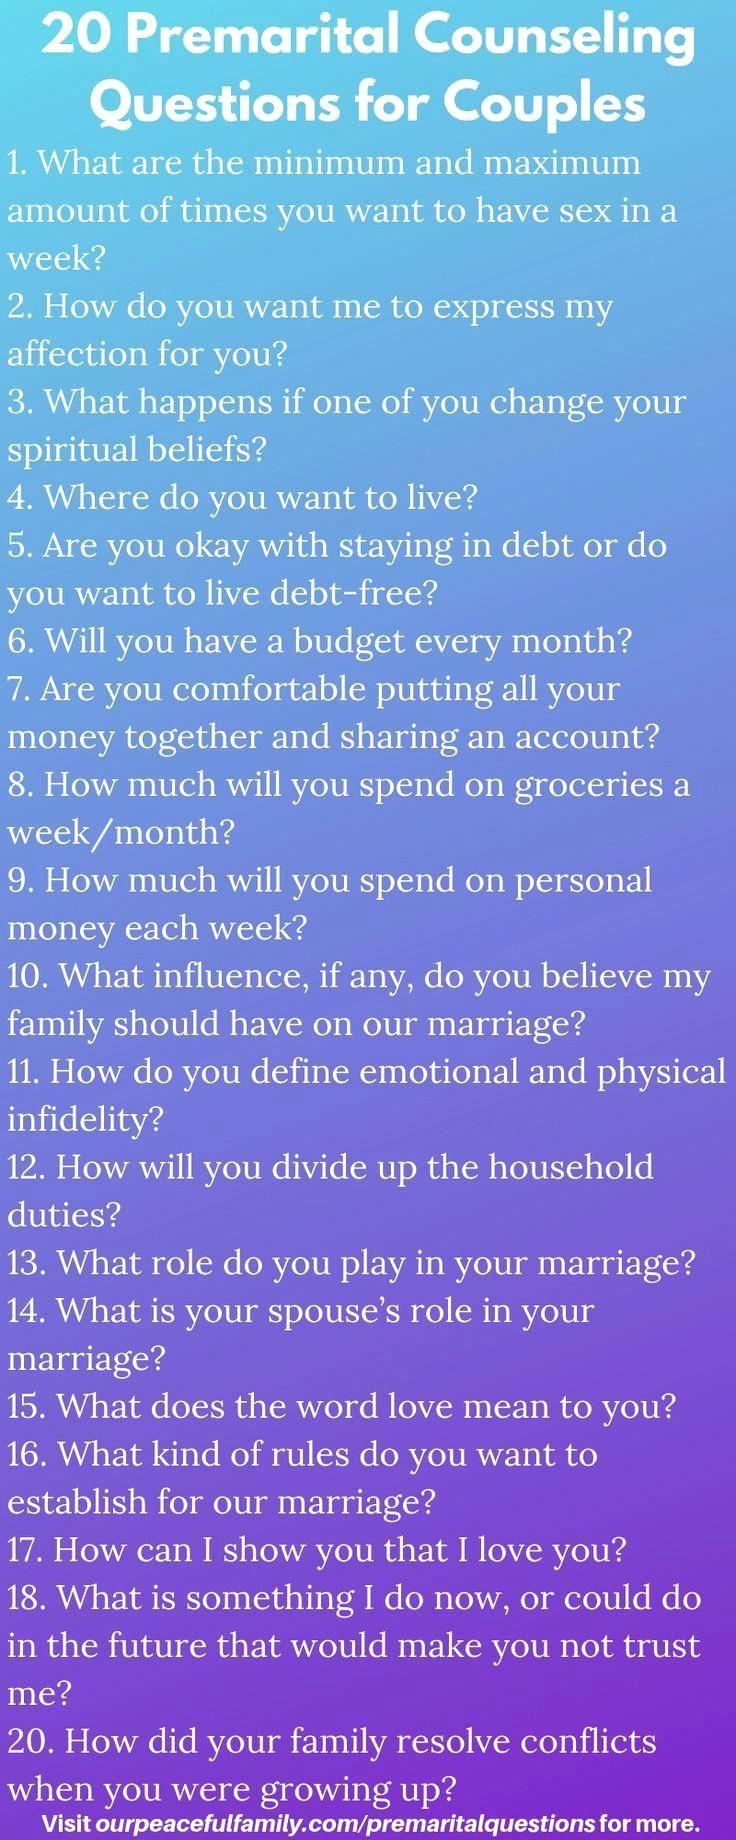 Premarital Counseling Questionaire